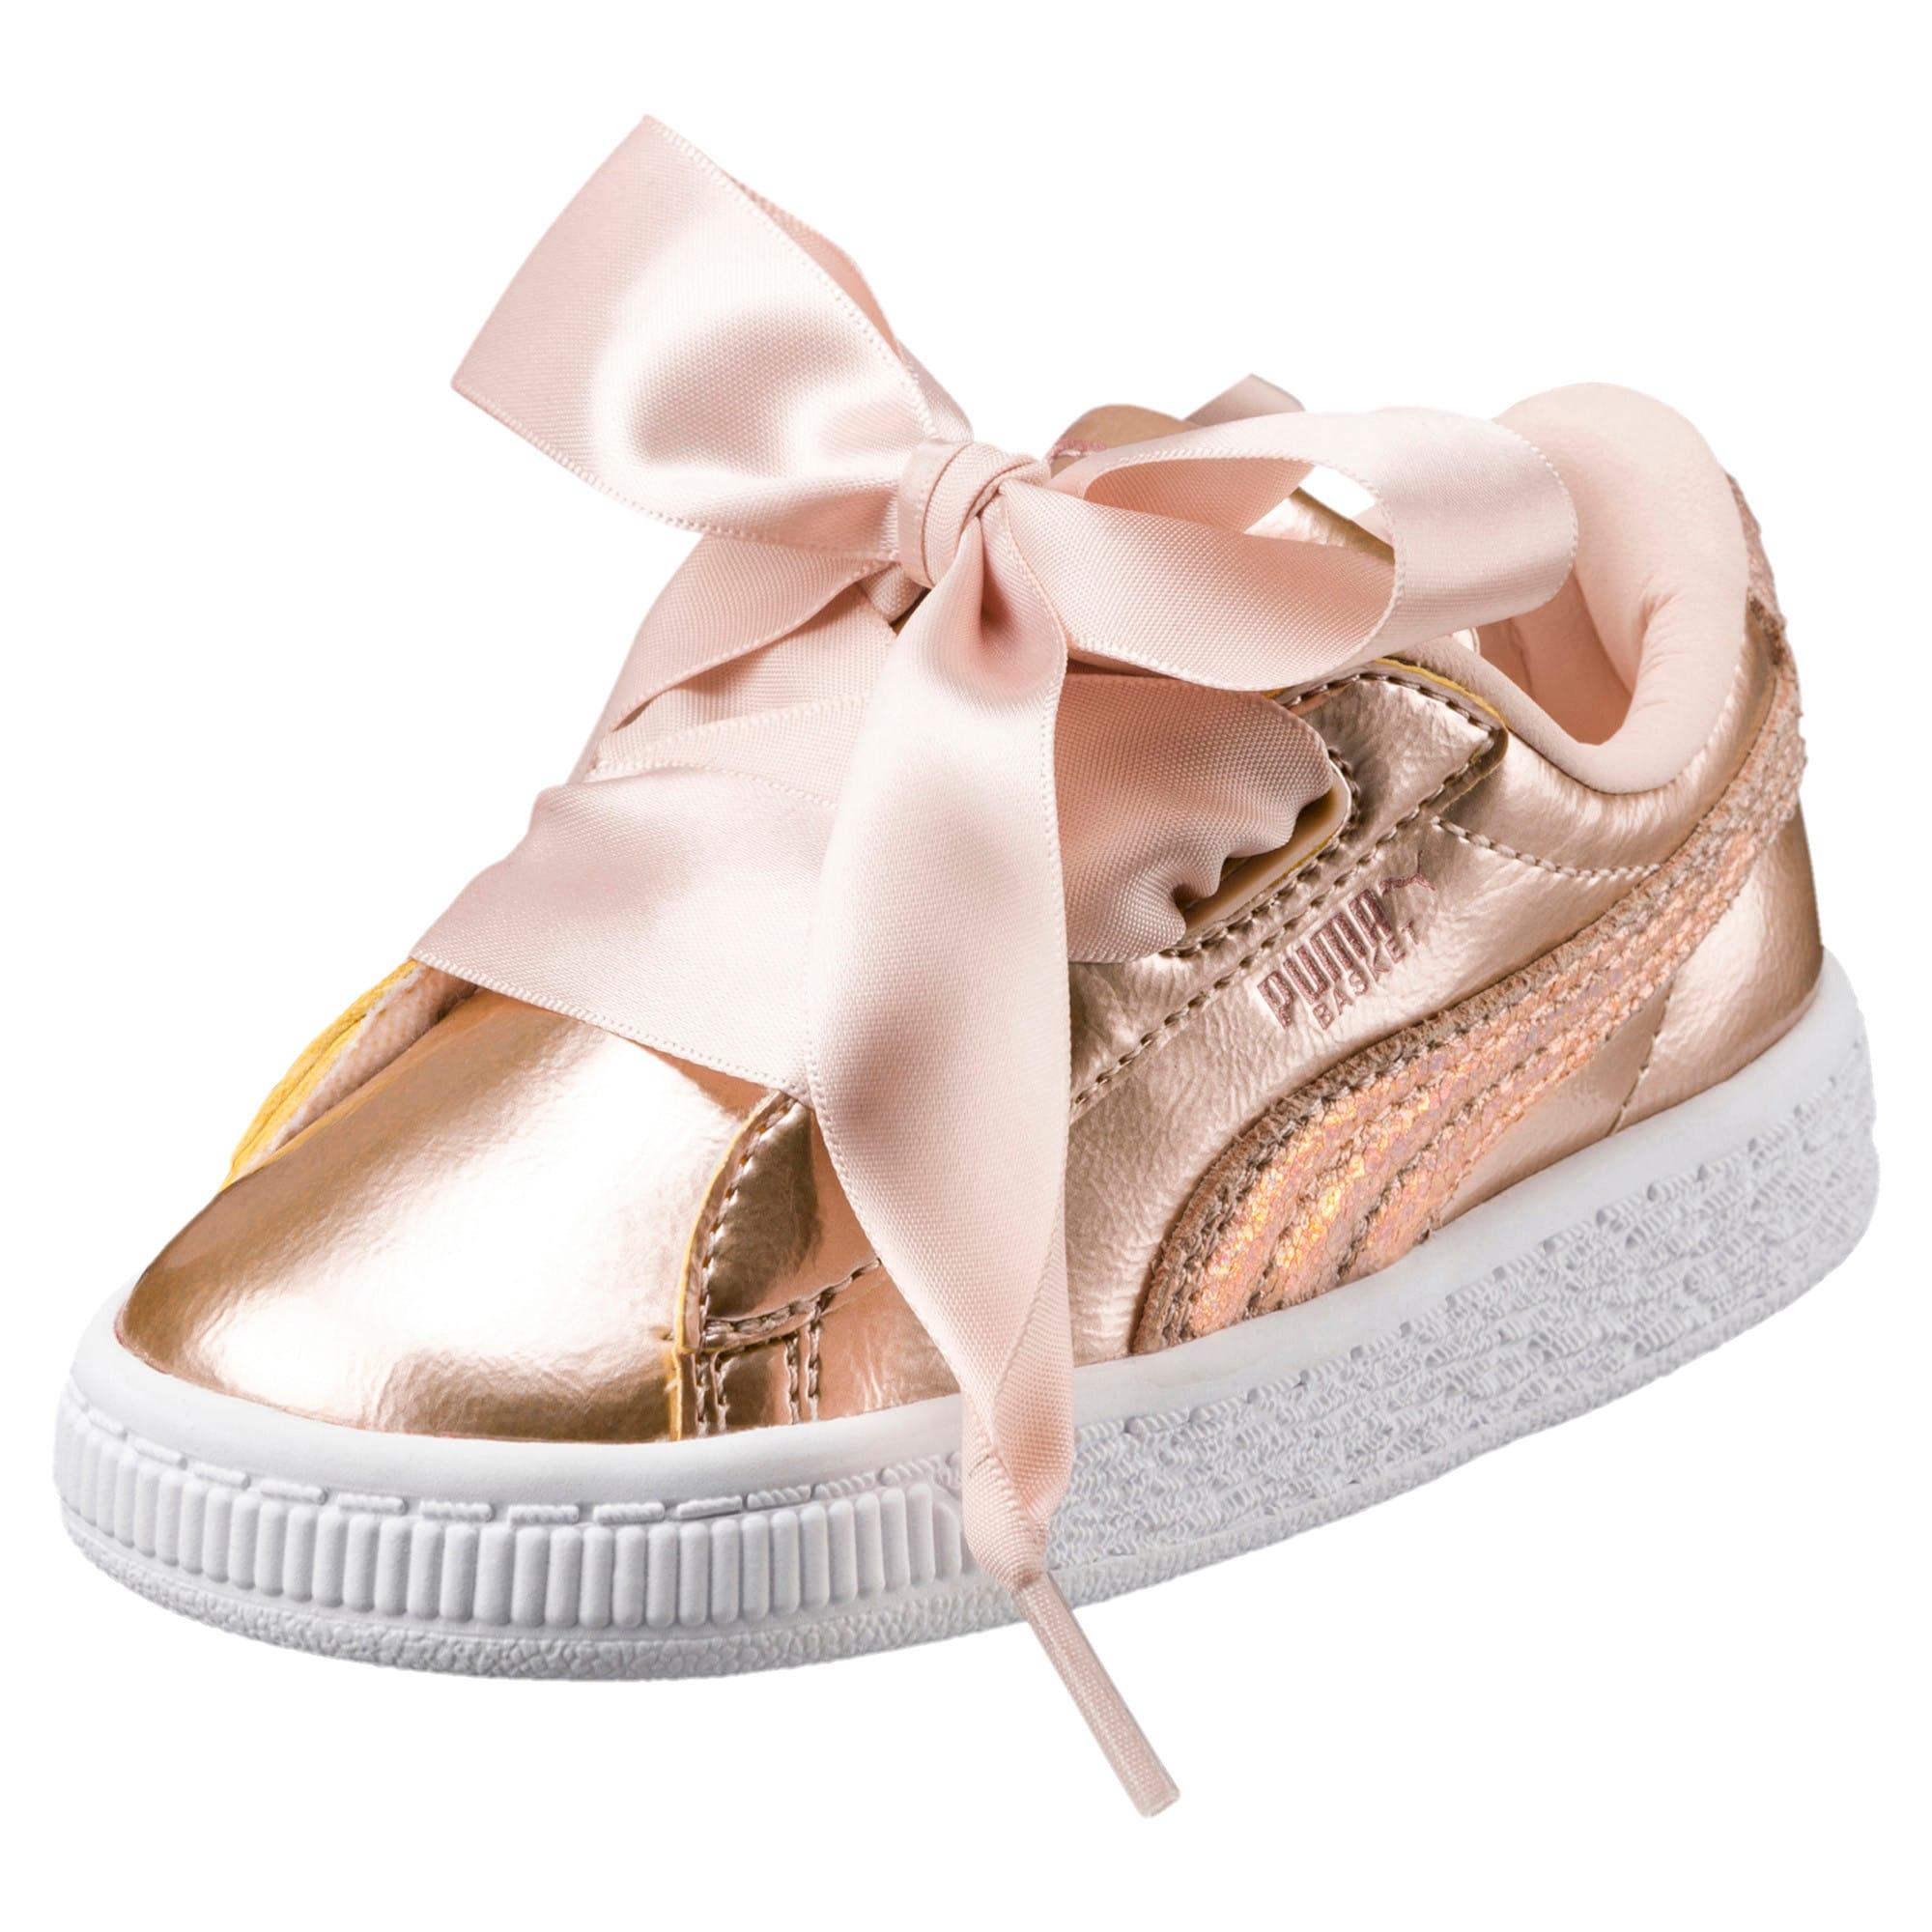 Thumbnail 1 of Basket Heart Lunar Lux Little Kids' Shoes, Cream Tan, medium